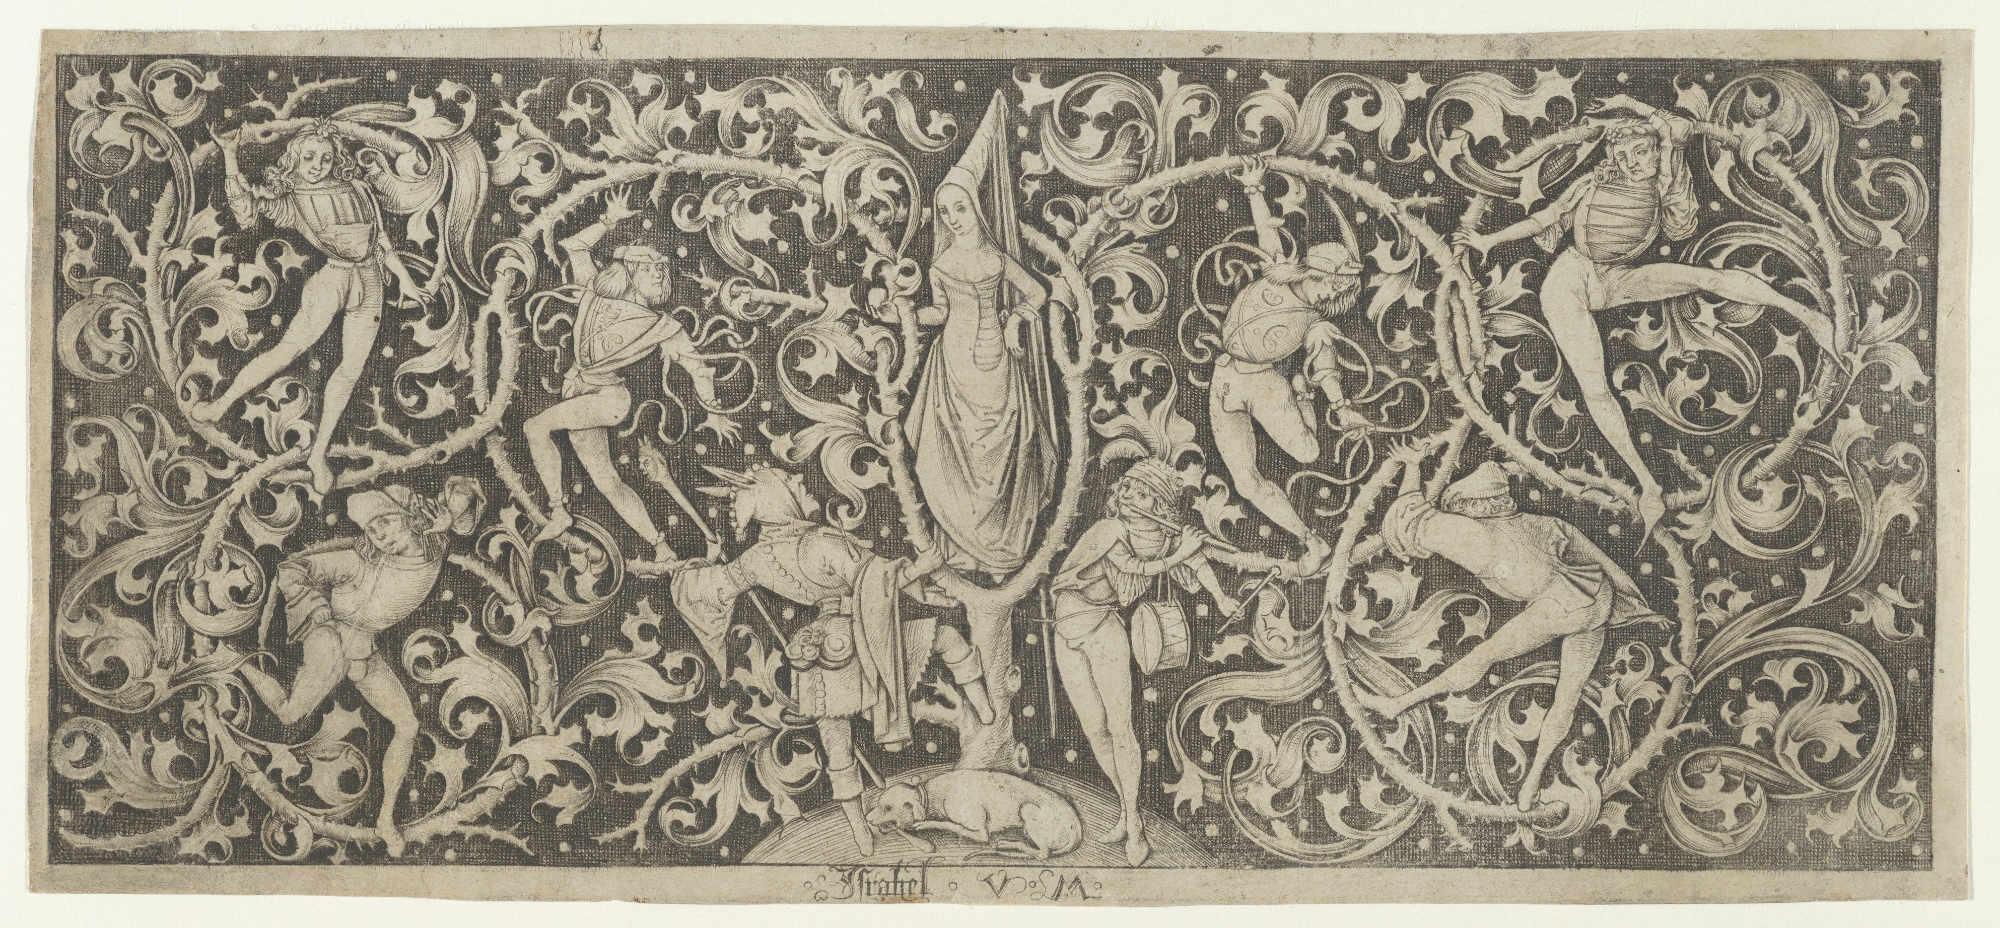 Israhel van Meckenem (German, Meckenem ca. 1440/45–1503 Bocholt)